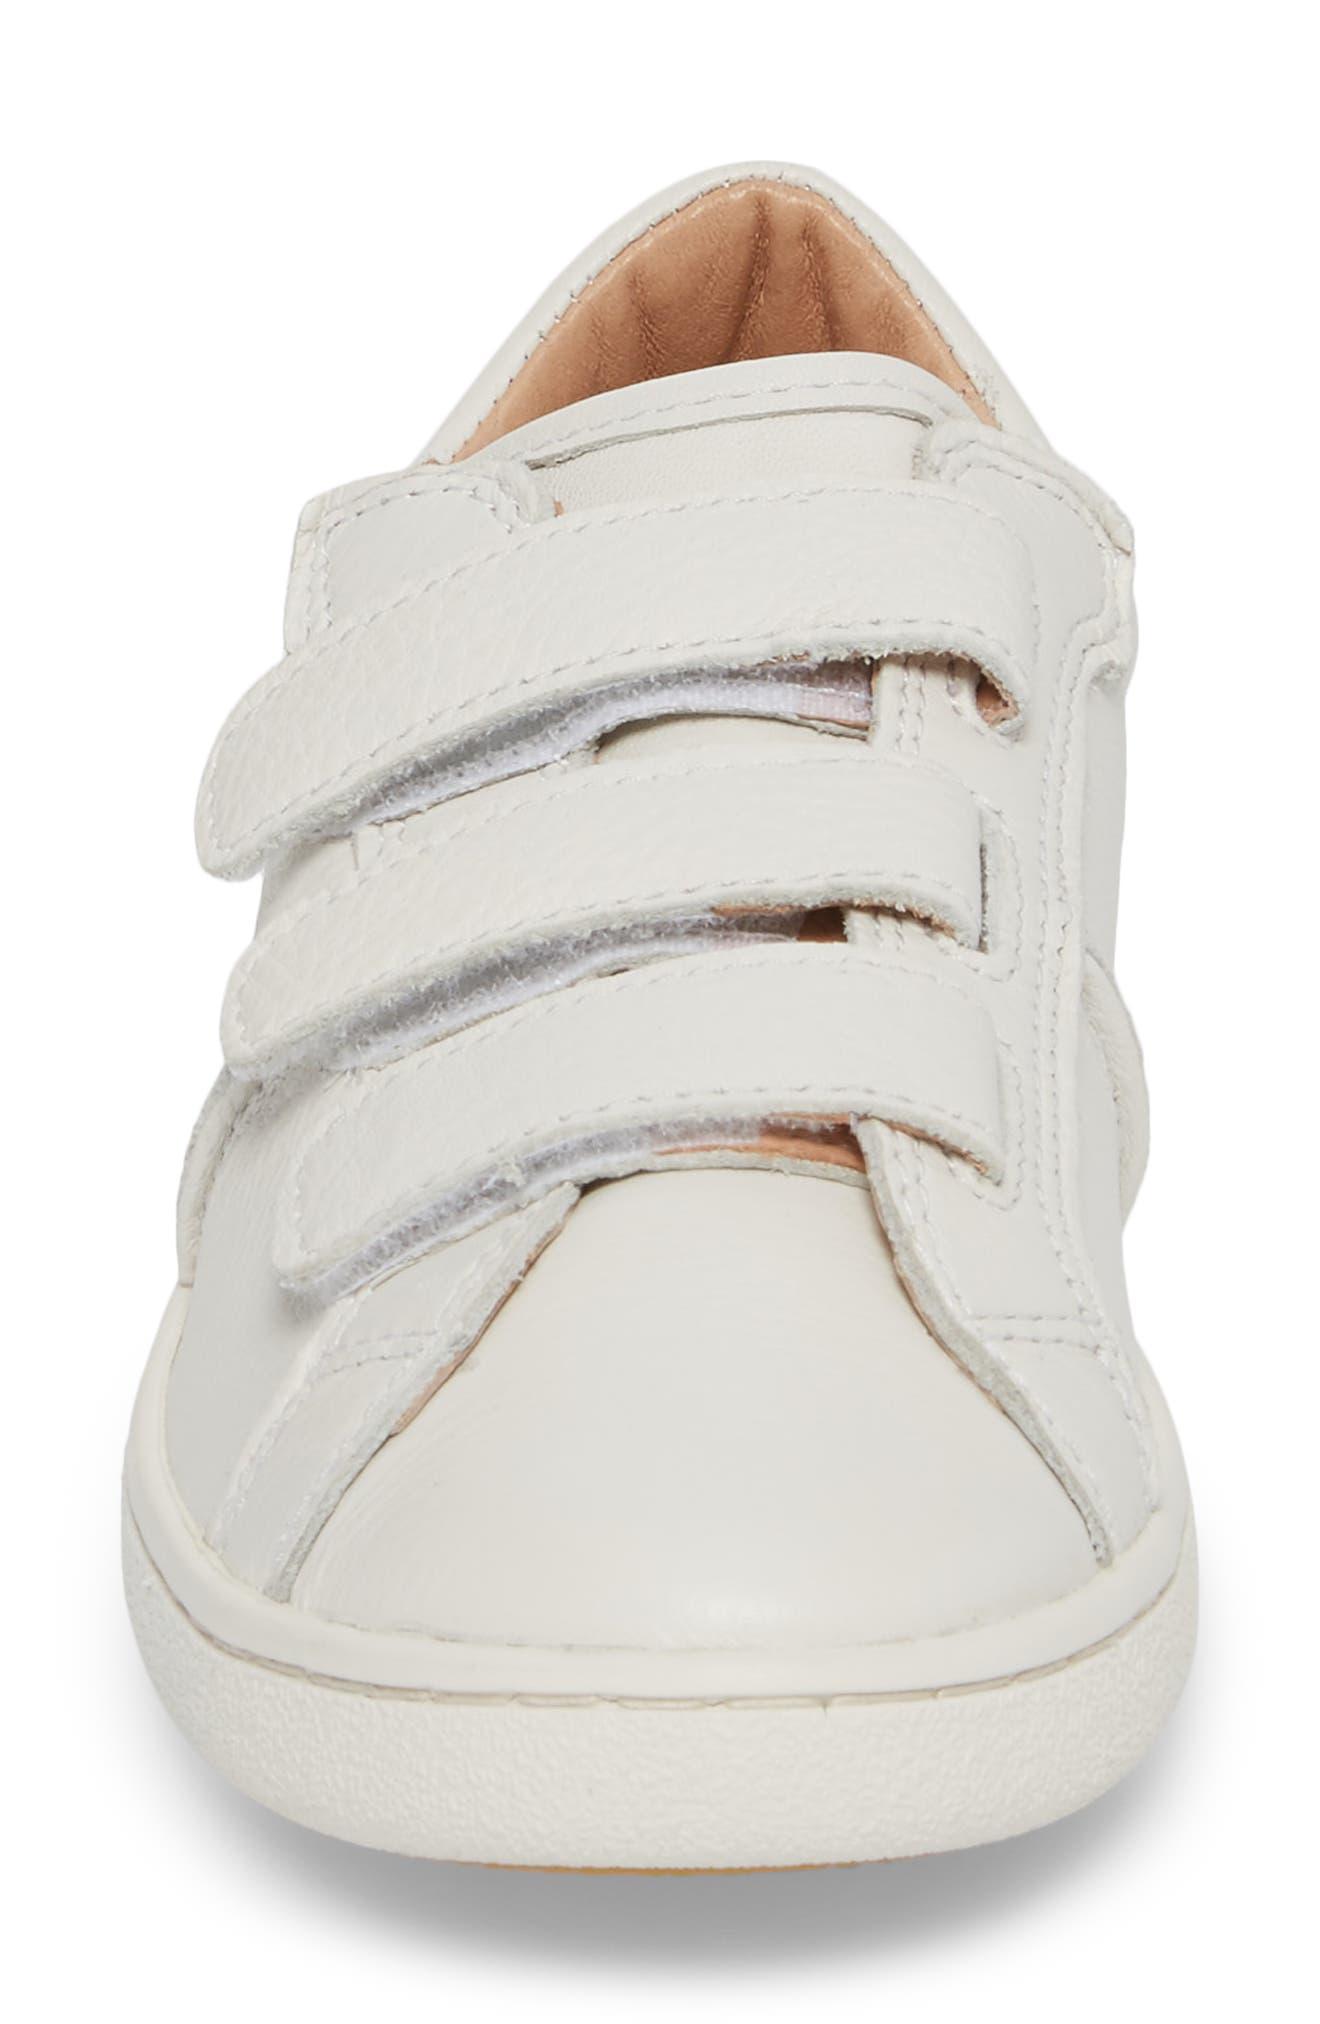 Alix Sneaker,                             Alternate thumbnail 4, color,                             WHITE LEATHER